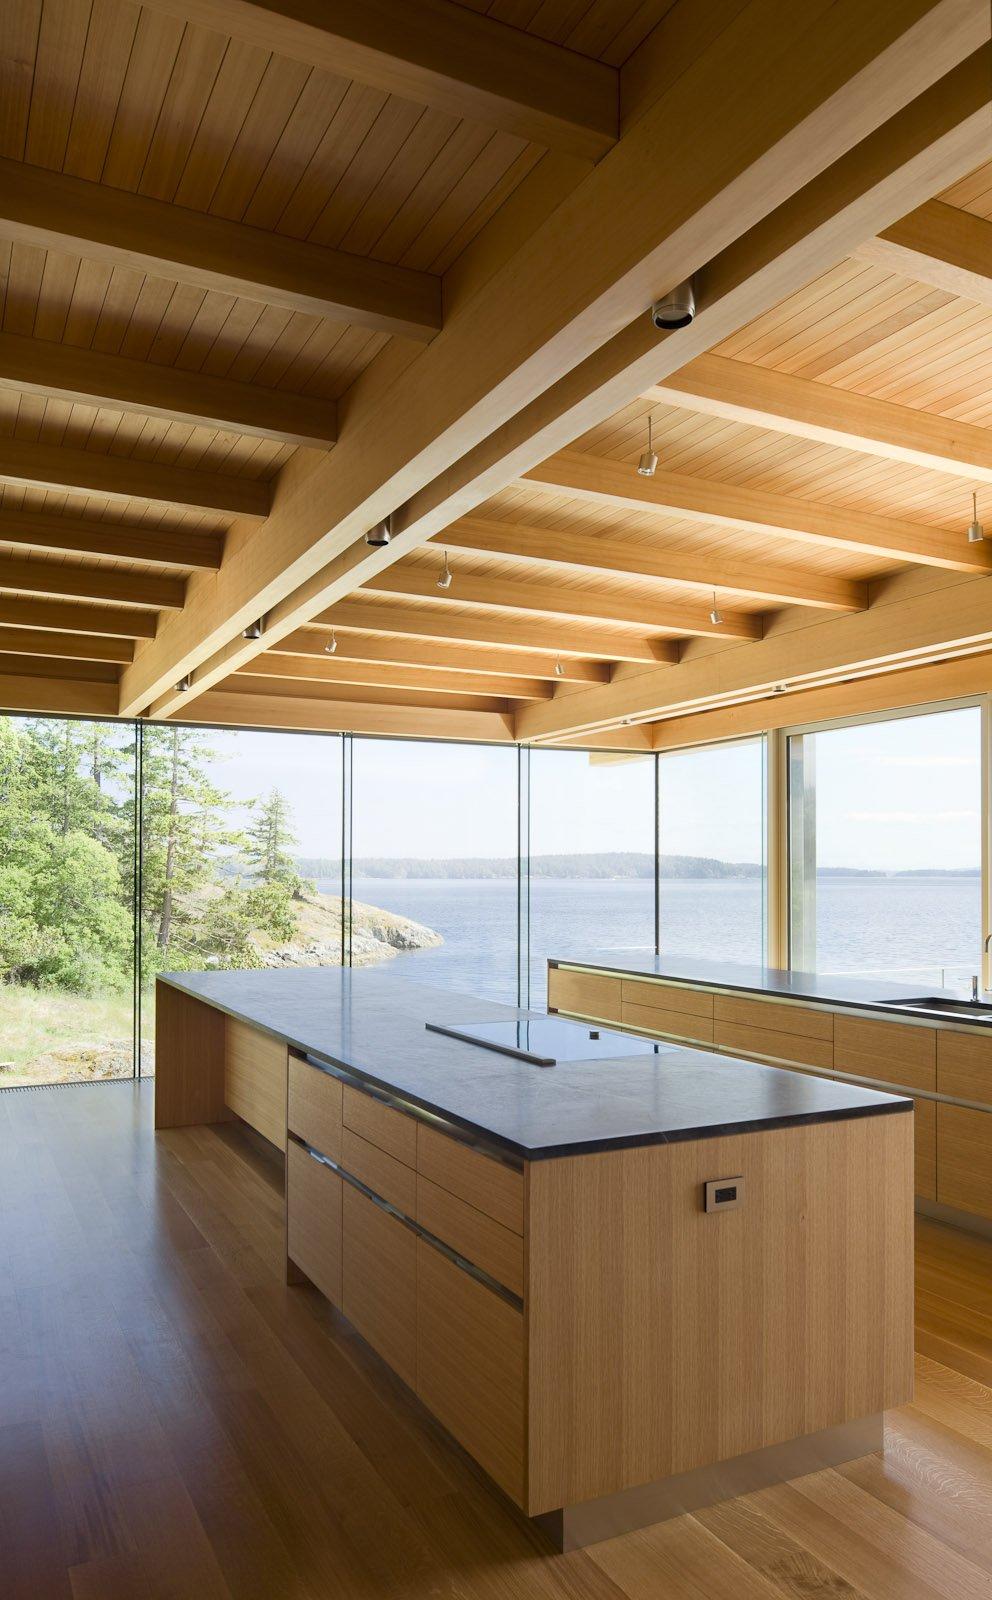 Kitchen Island, Ocean Views, Oceanfront Home in British Columbia, Canada